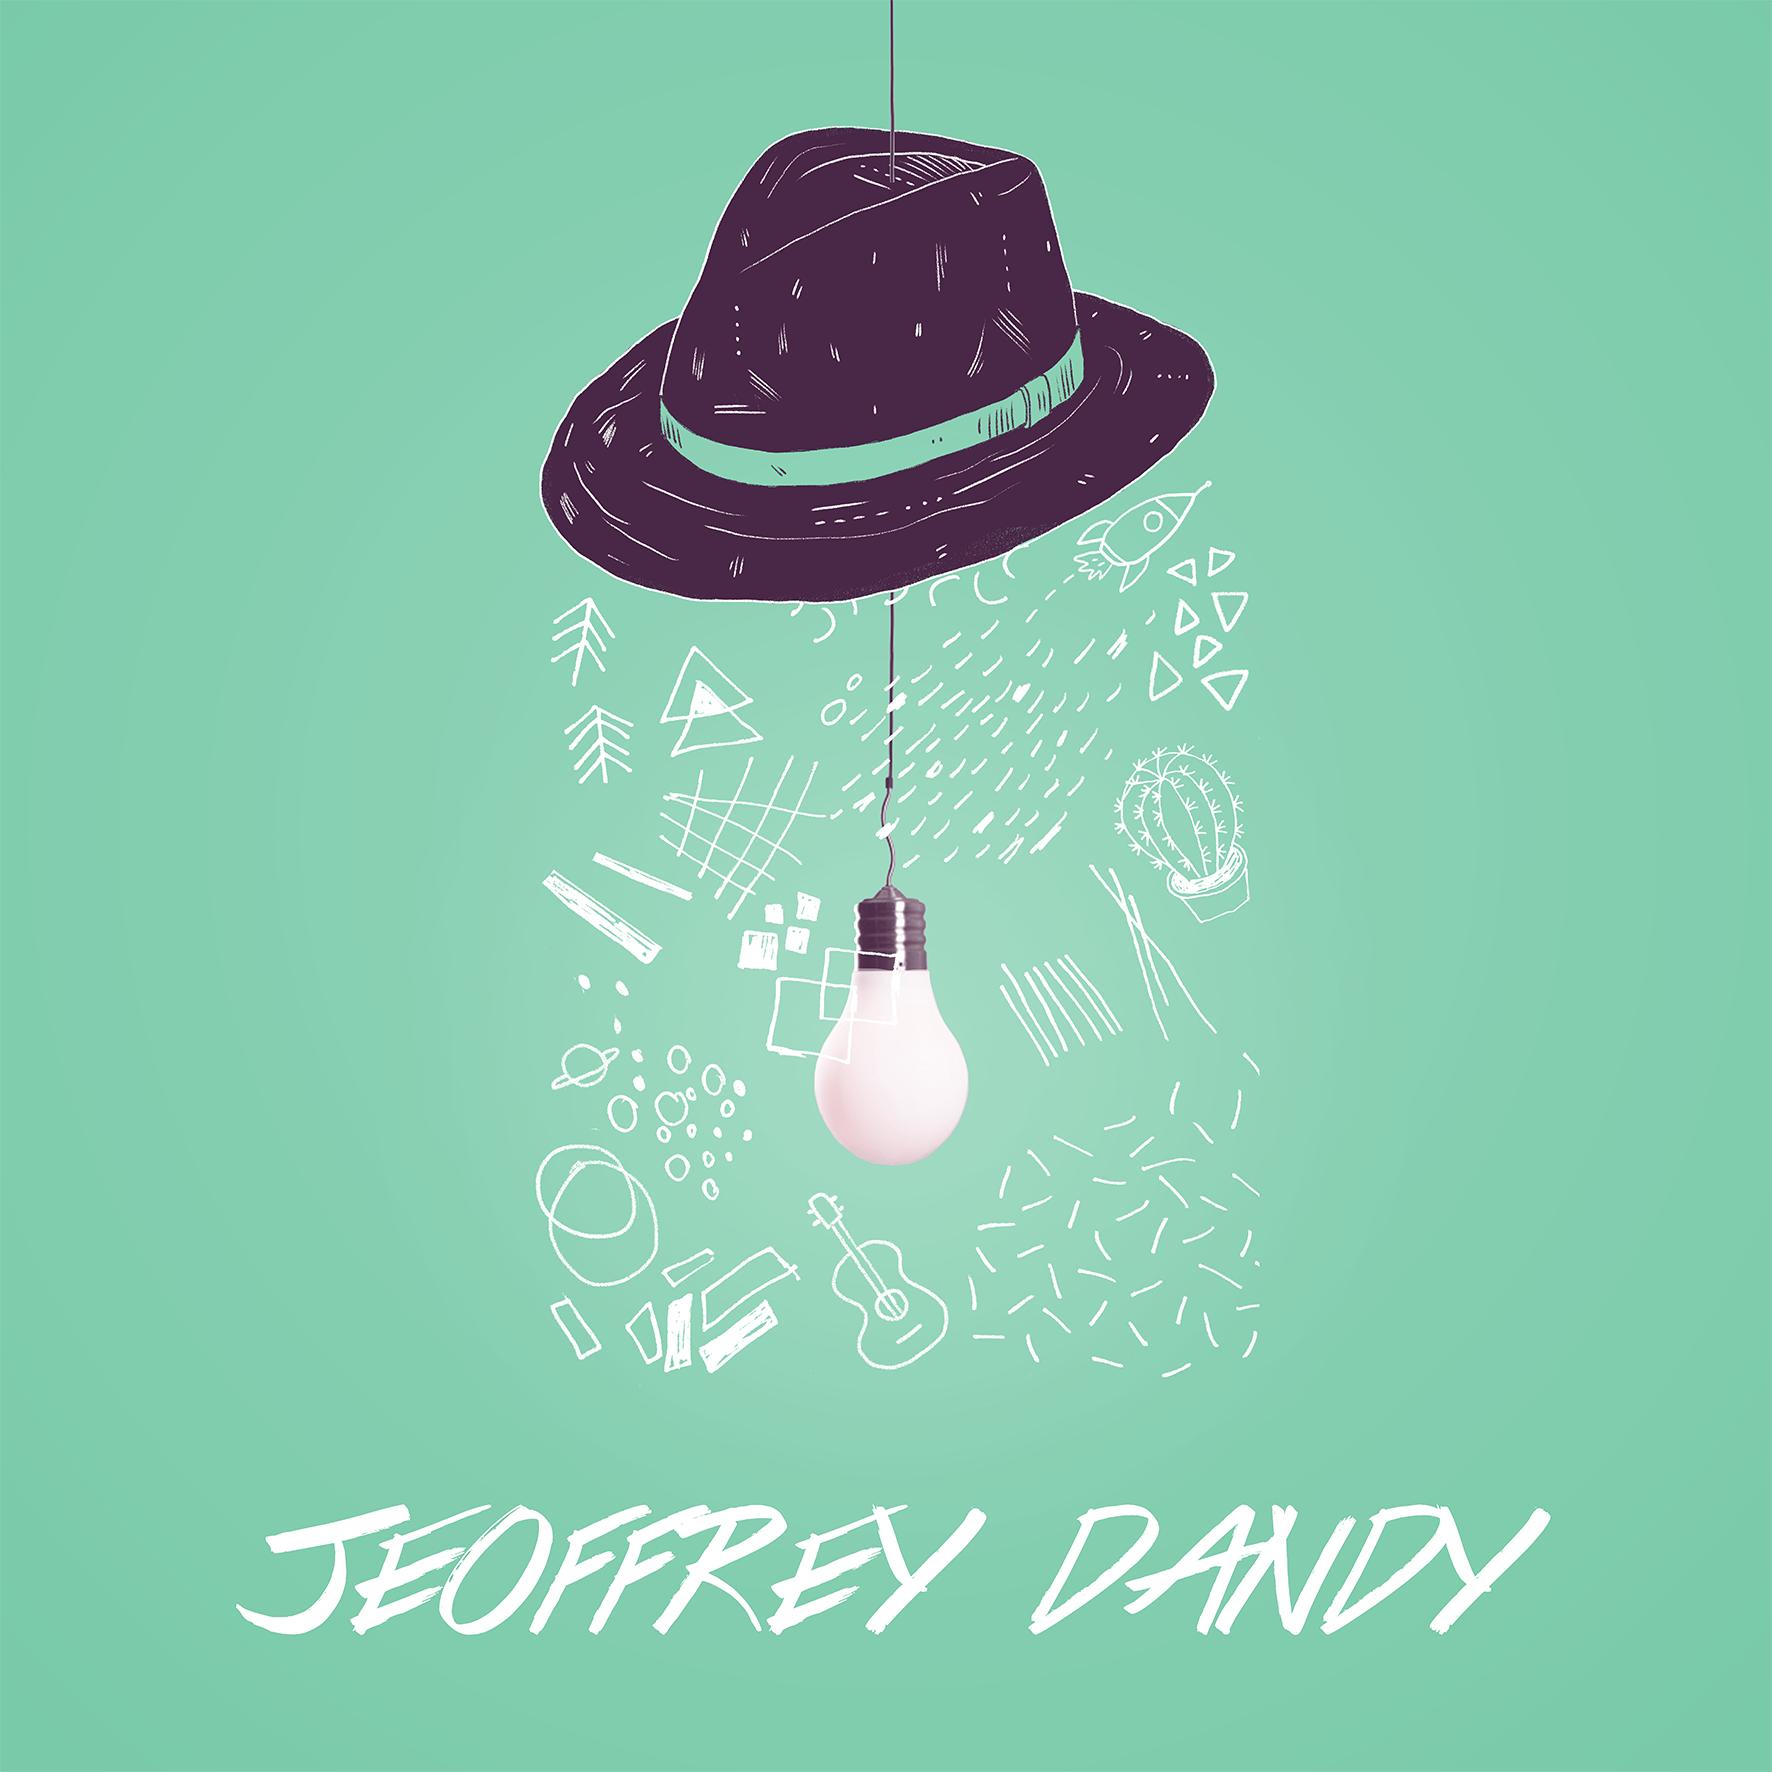 Jeoffrey Dandy JustMusic.fr